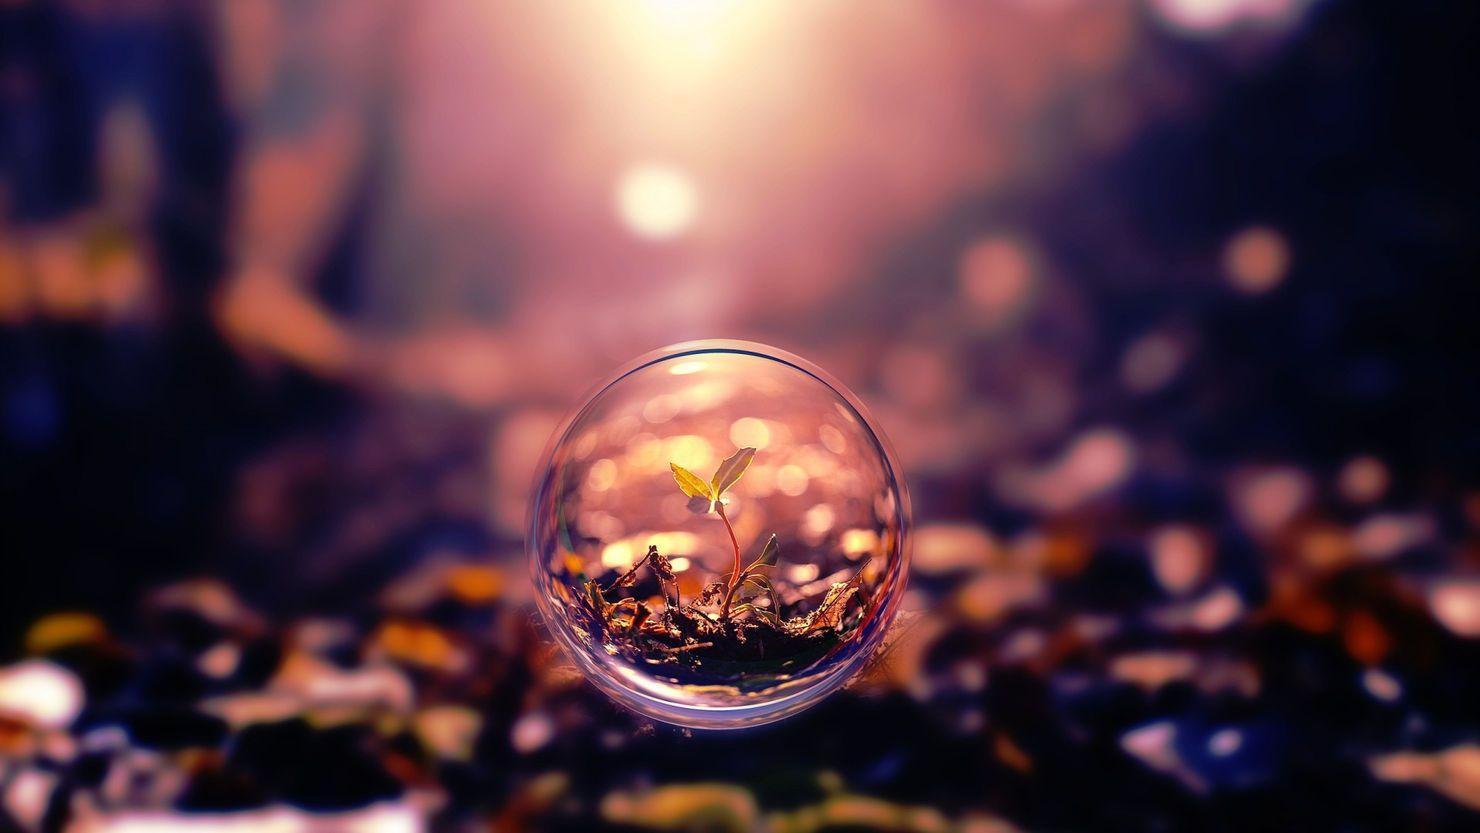 Meet The Requirements Of Your Requirements Photography Wallpaper Bubbles Wallpaper Desktop Wallpaper